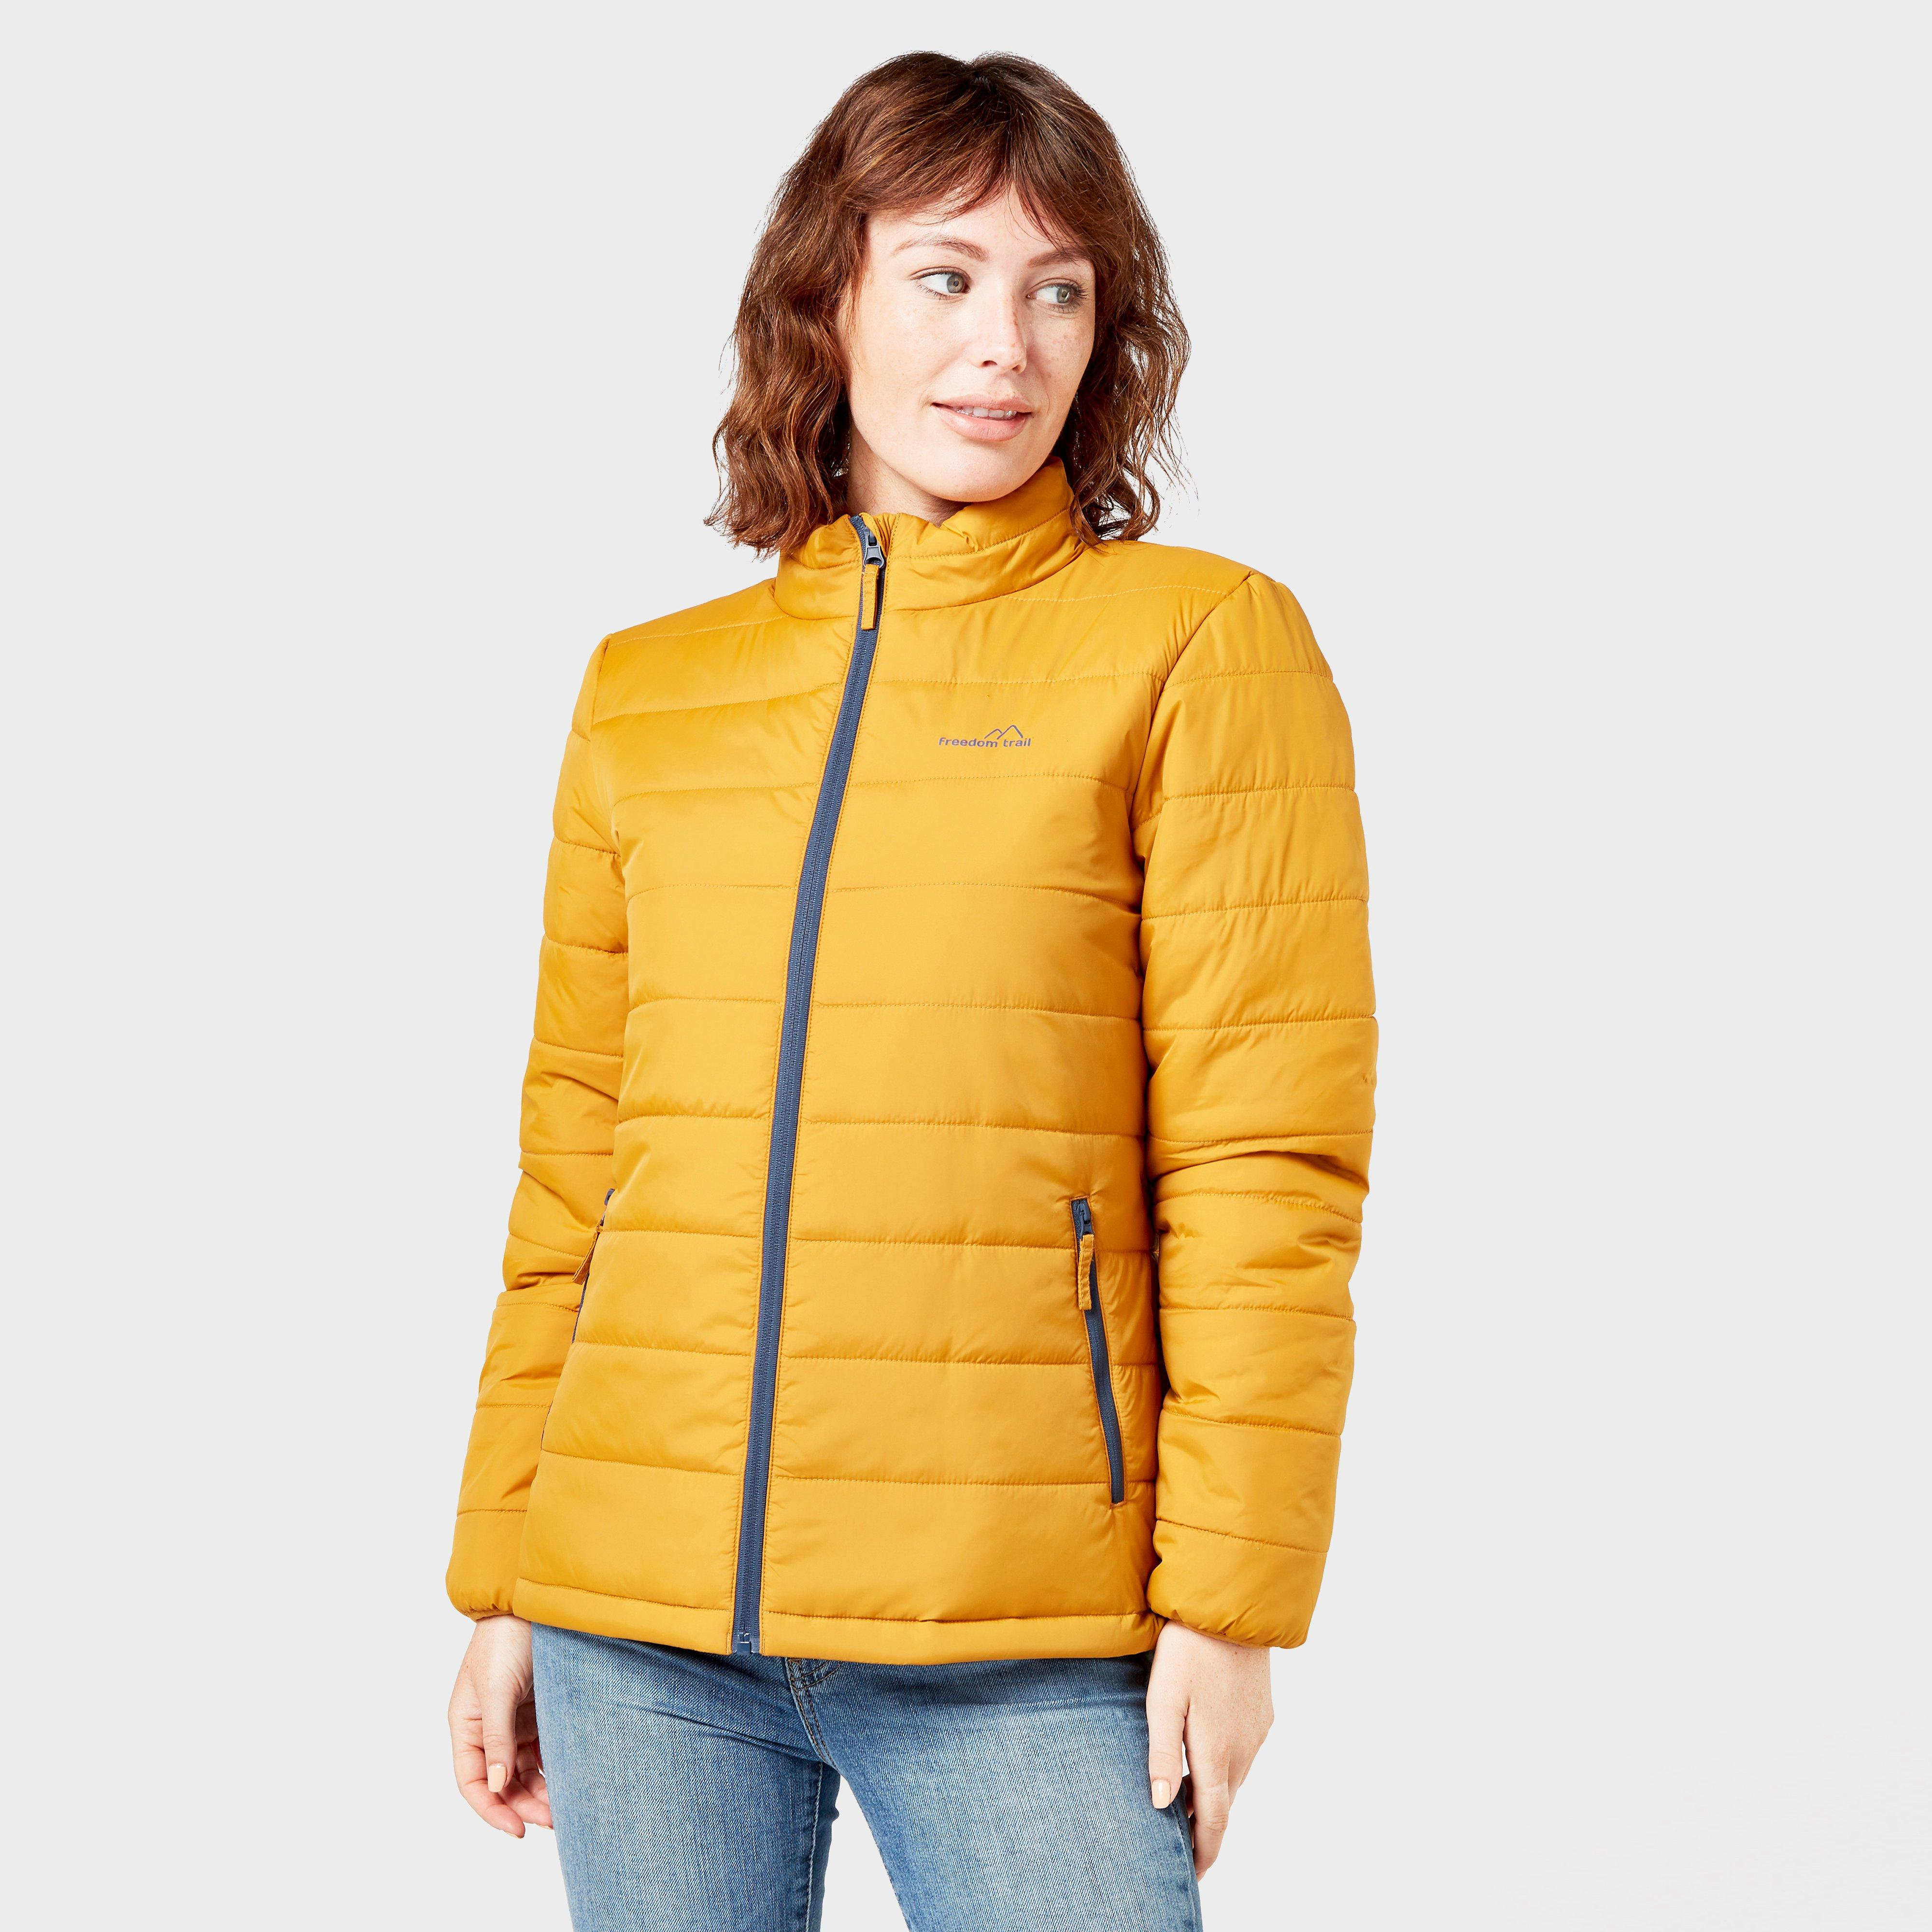 Freedom Trail Women's Blisco Padded Jacket, Yellow